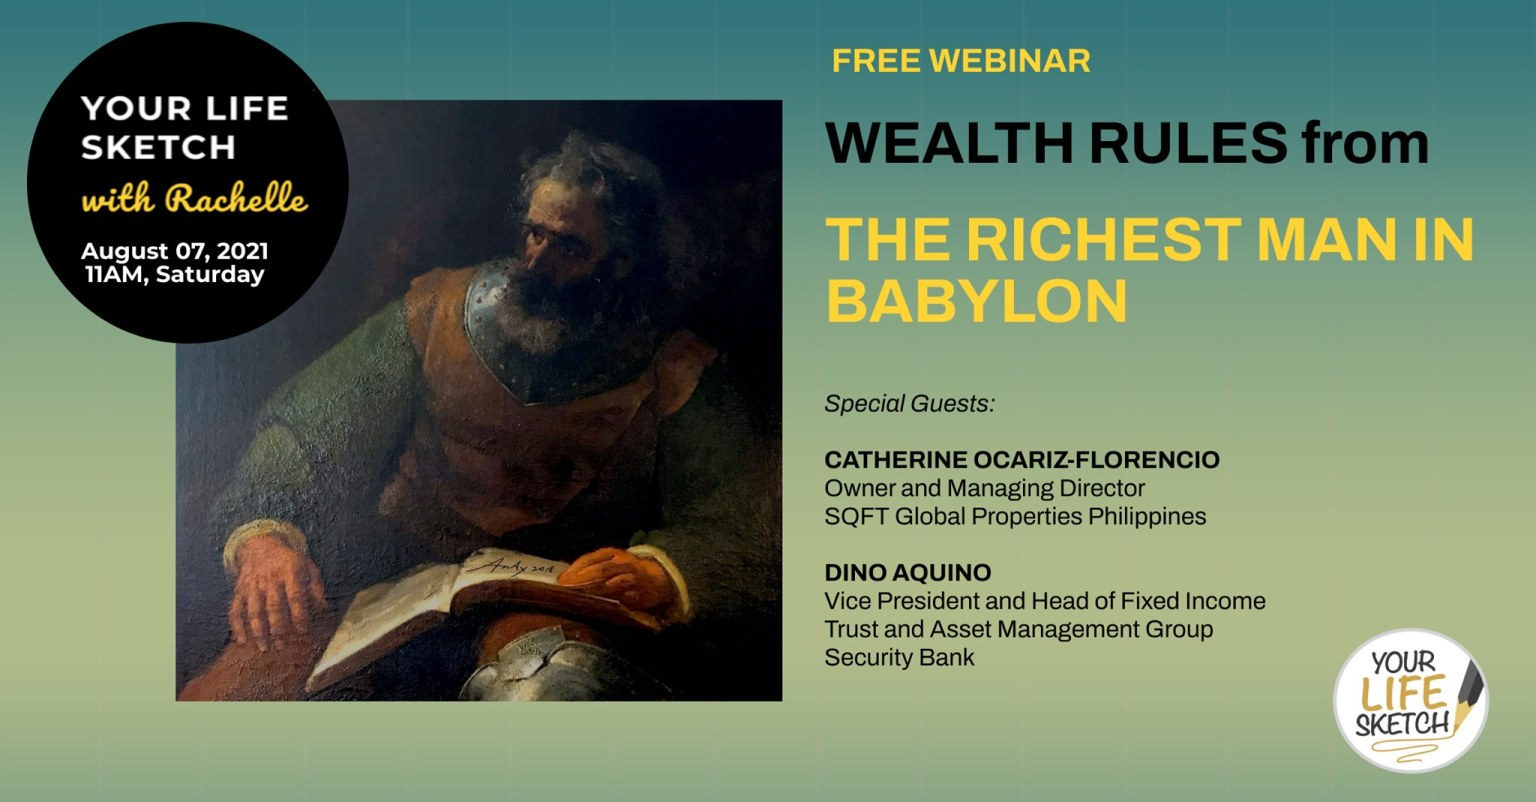 YLS Free Webinar: The Richest Man in Babylon